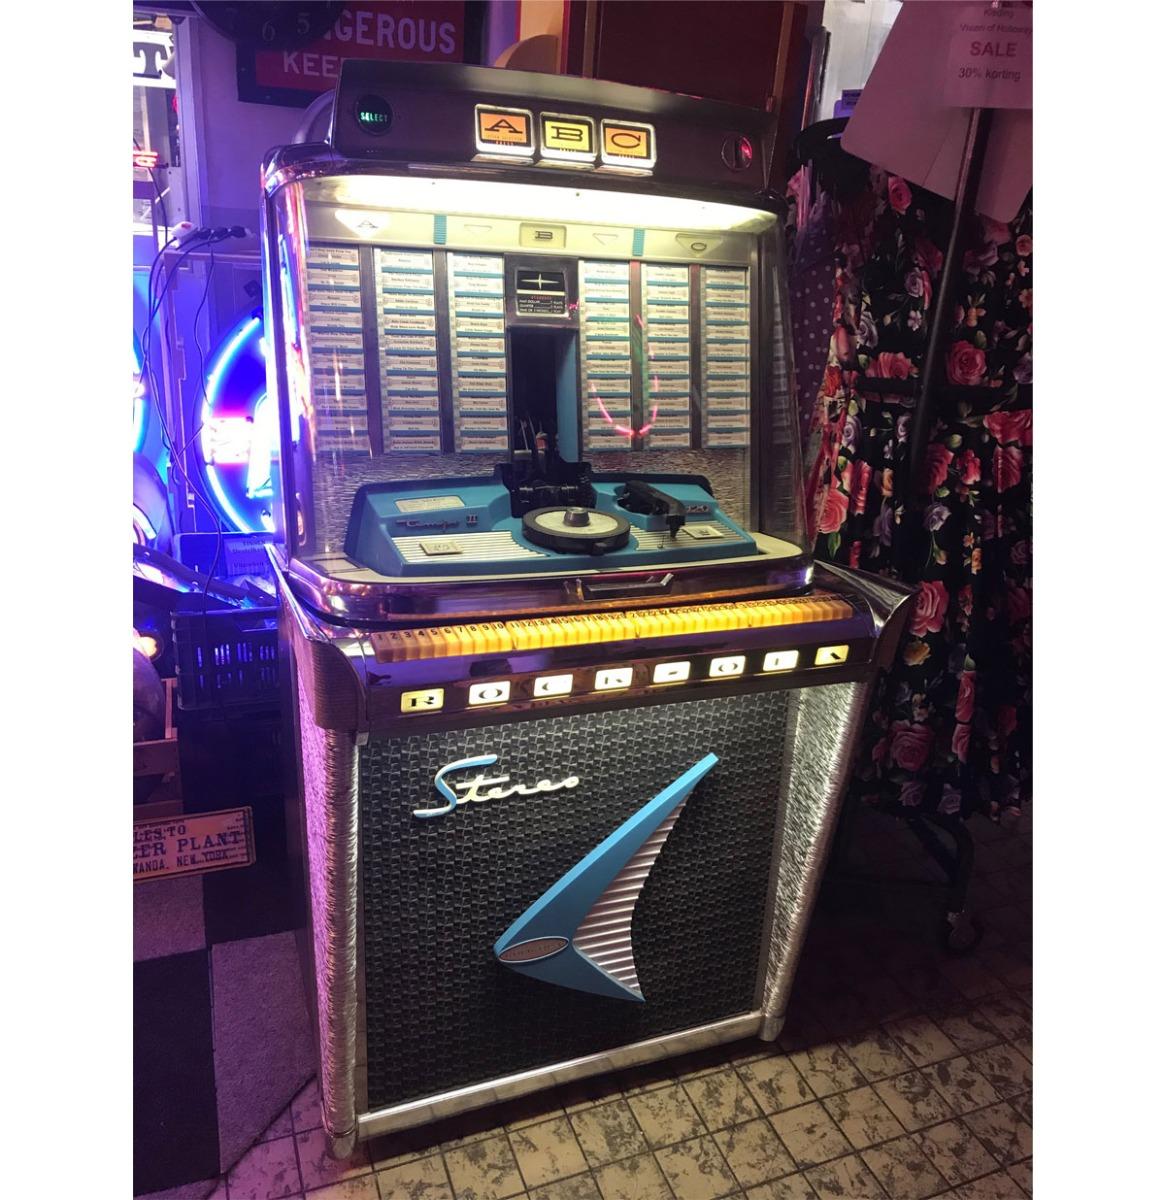 Rock-Ola Model 1478 Tempo 2 Jukebox - 120 Selecties - Gerestaureerd